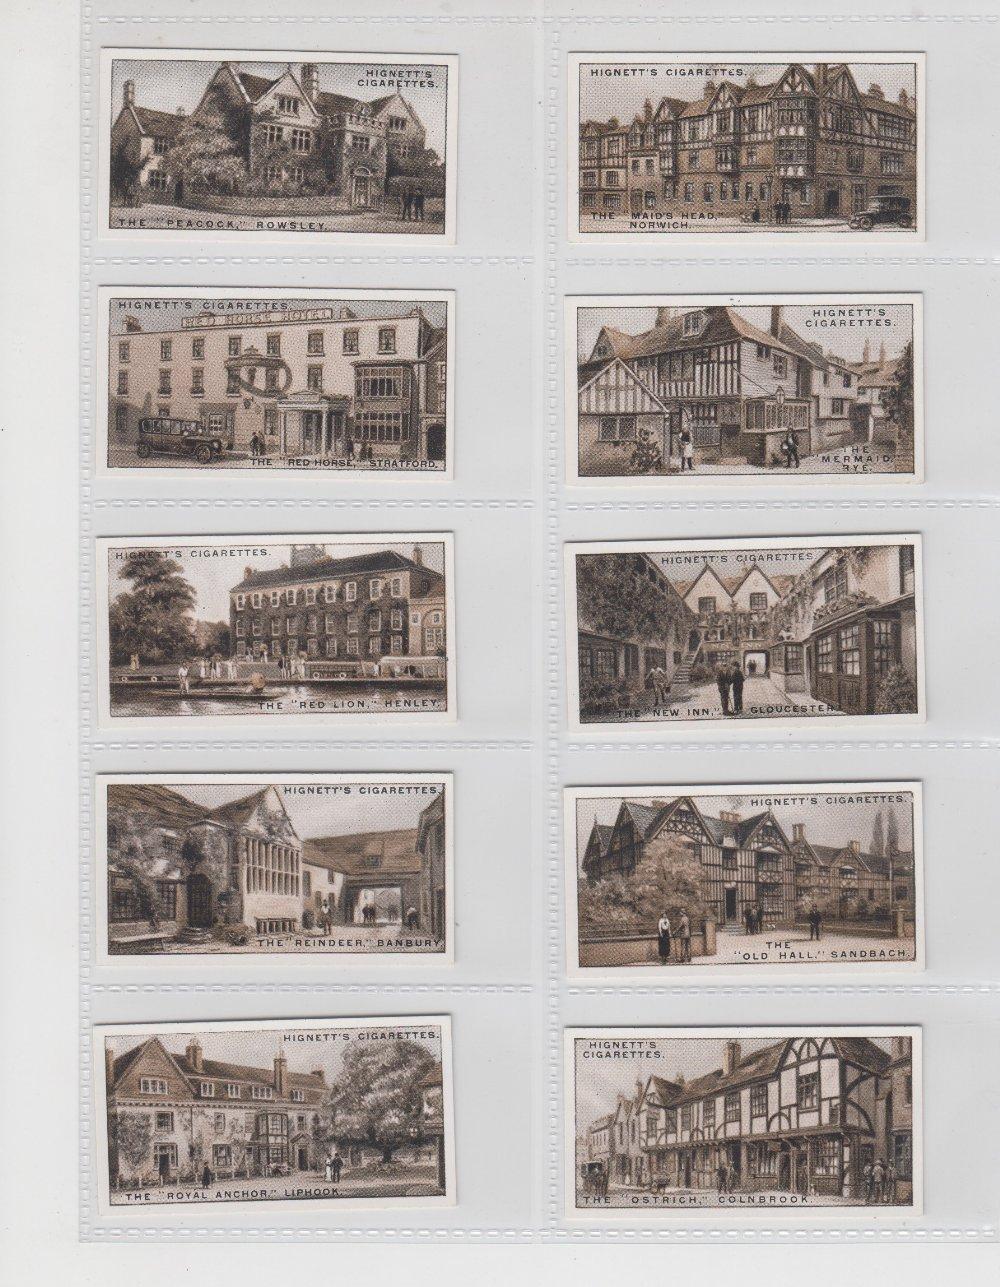 Lot 214 - Cigarette cards, Hignett's, Celebrated Old Inns (set, 50 cards) (vg/ex)